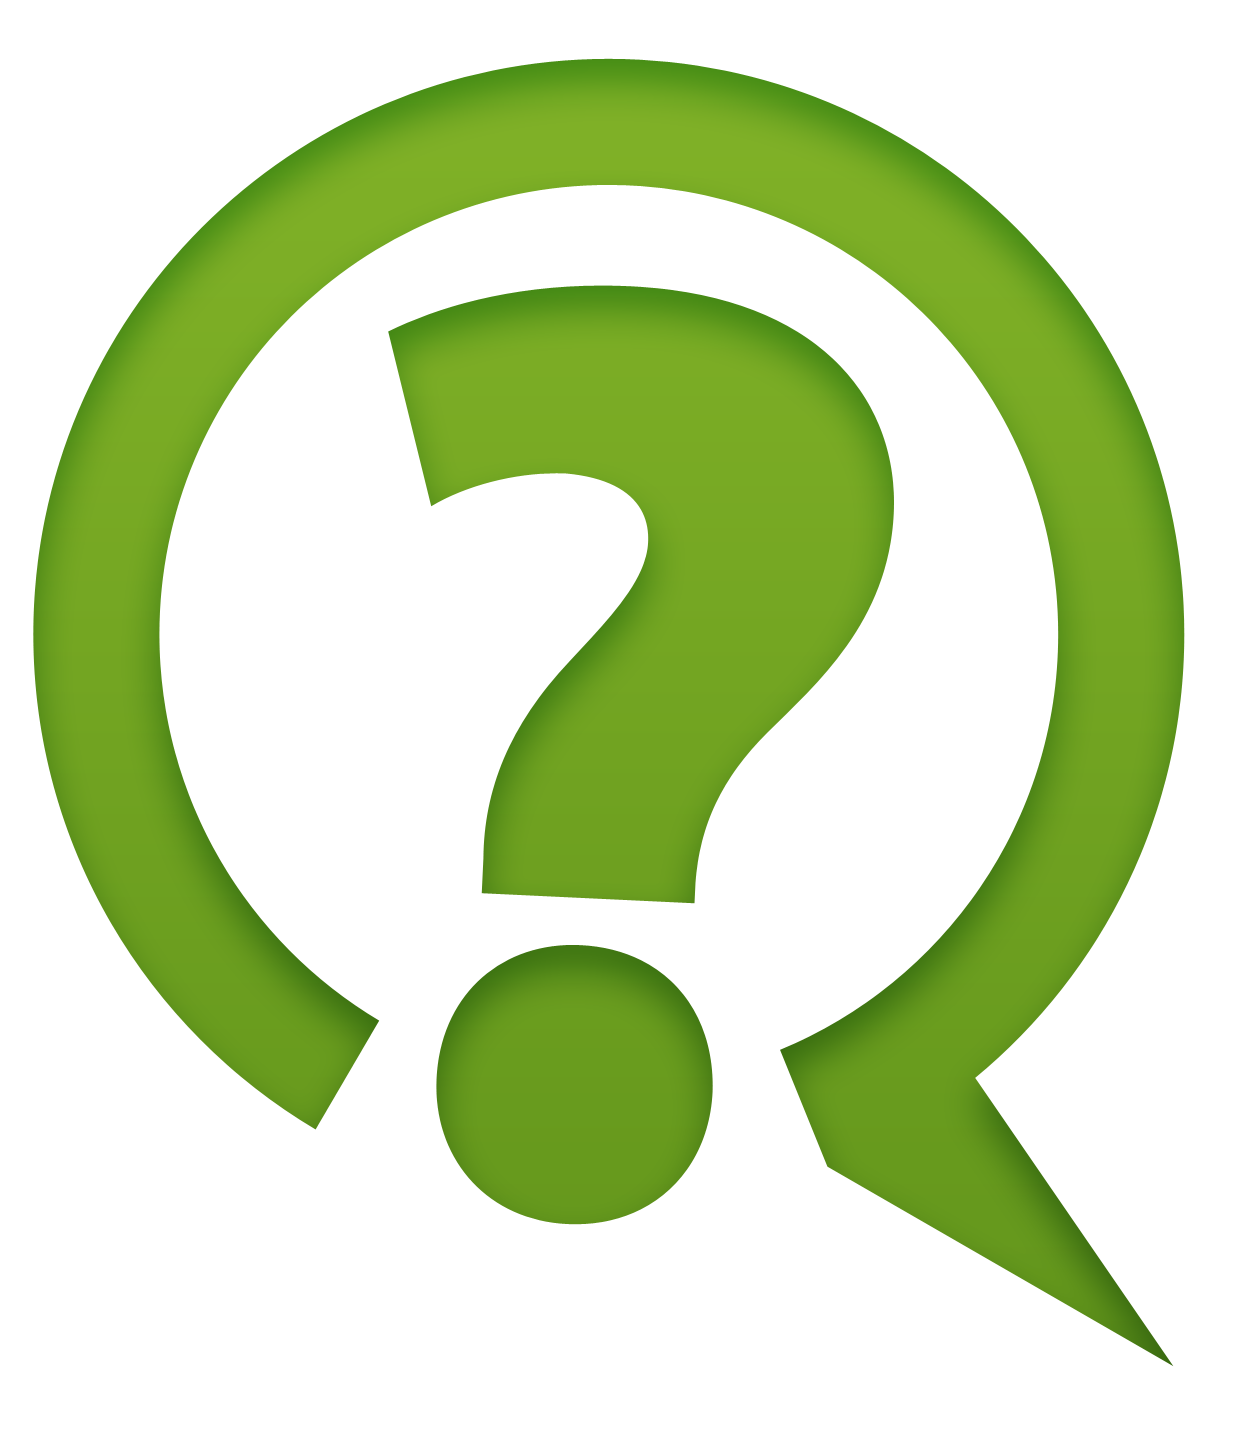 Logo question